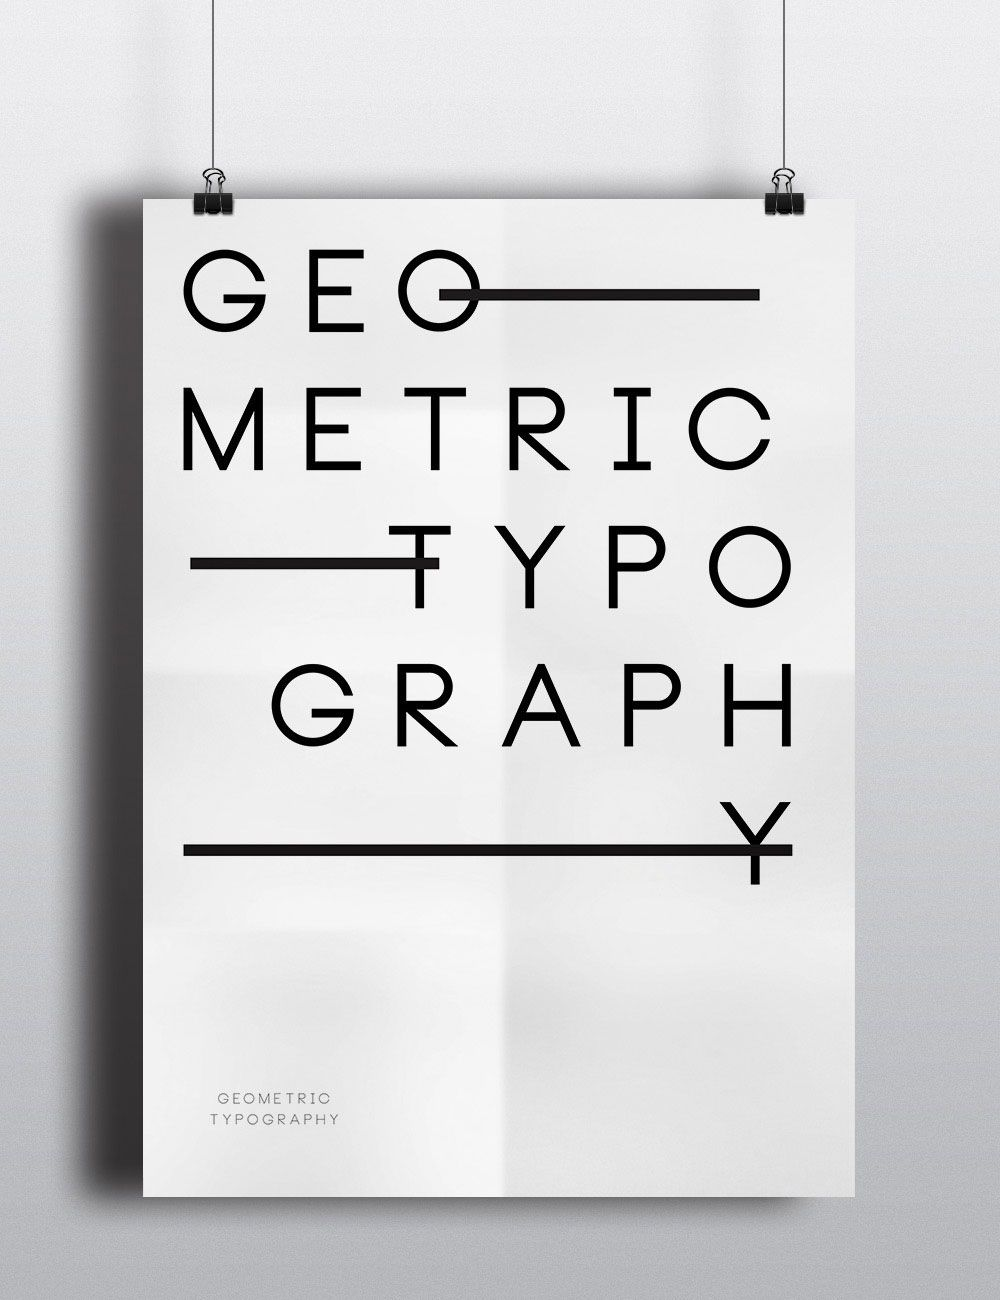 carla talabá on behance typography graphing geometric on wall street bets logo id=97206